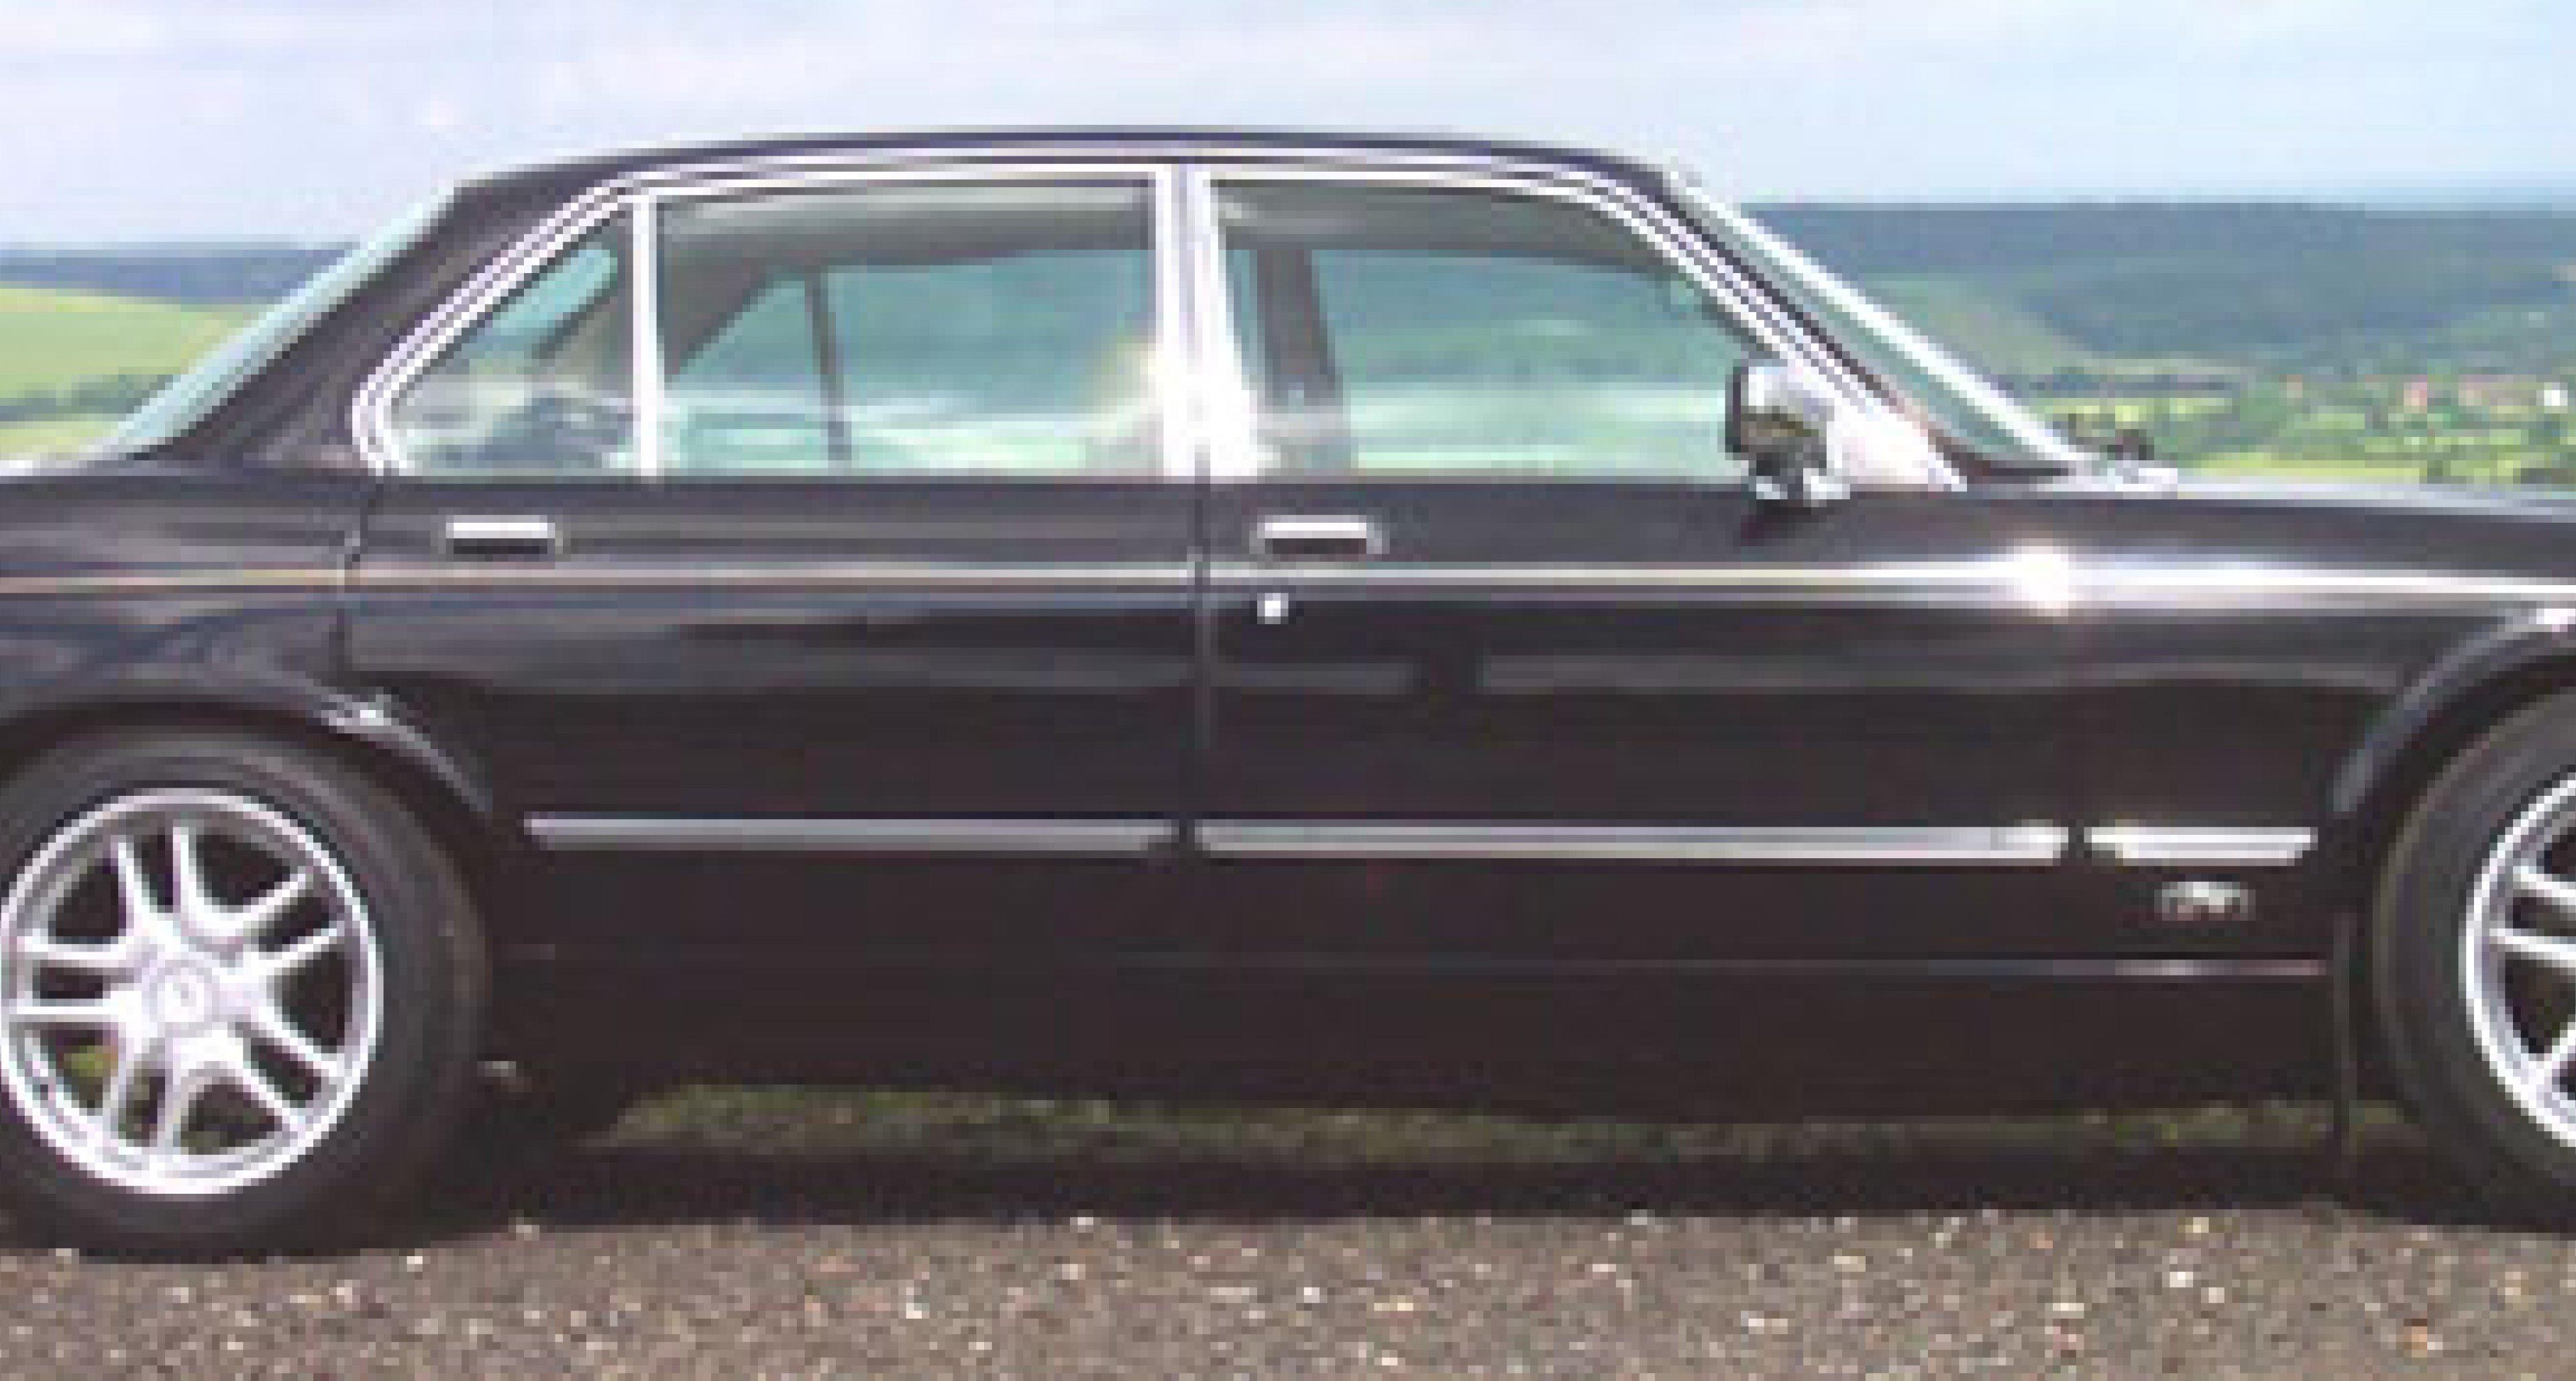 KWE enhanced Jaguars - the modern alternative